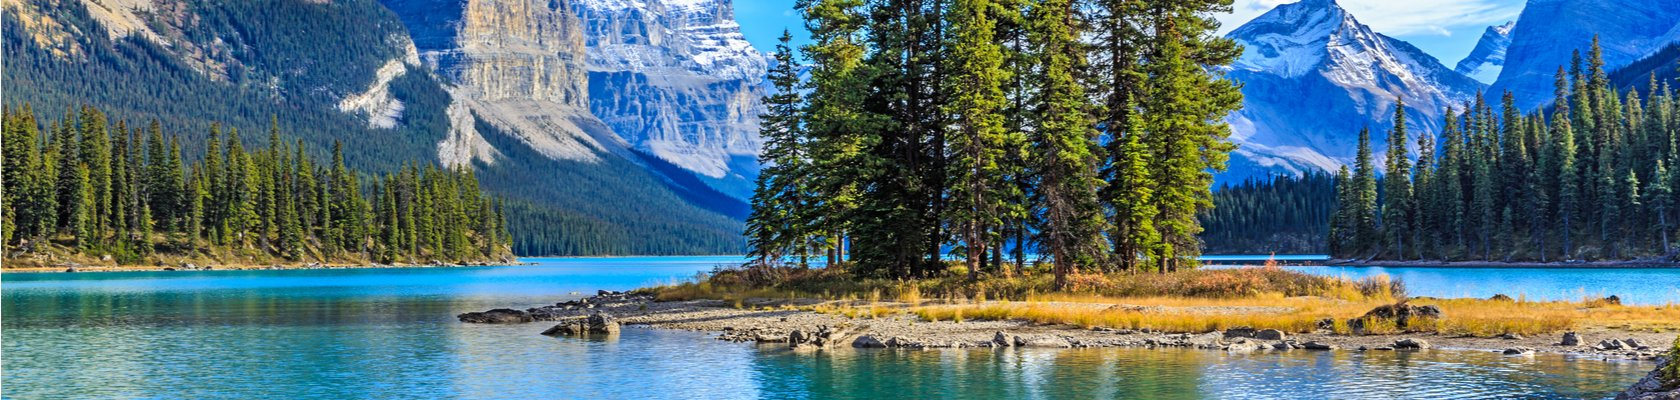 Jasper Spirit Islands